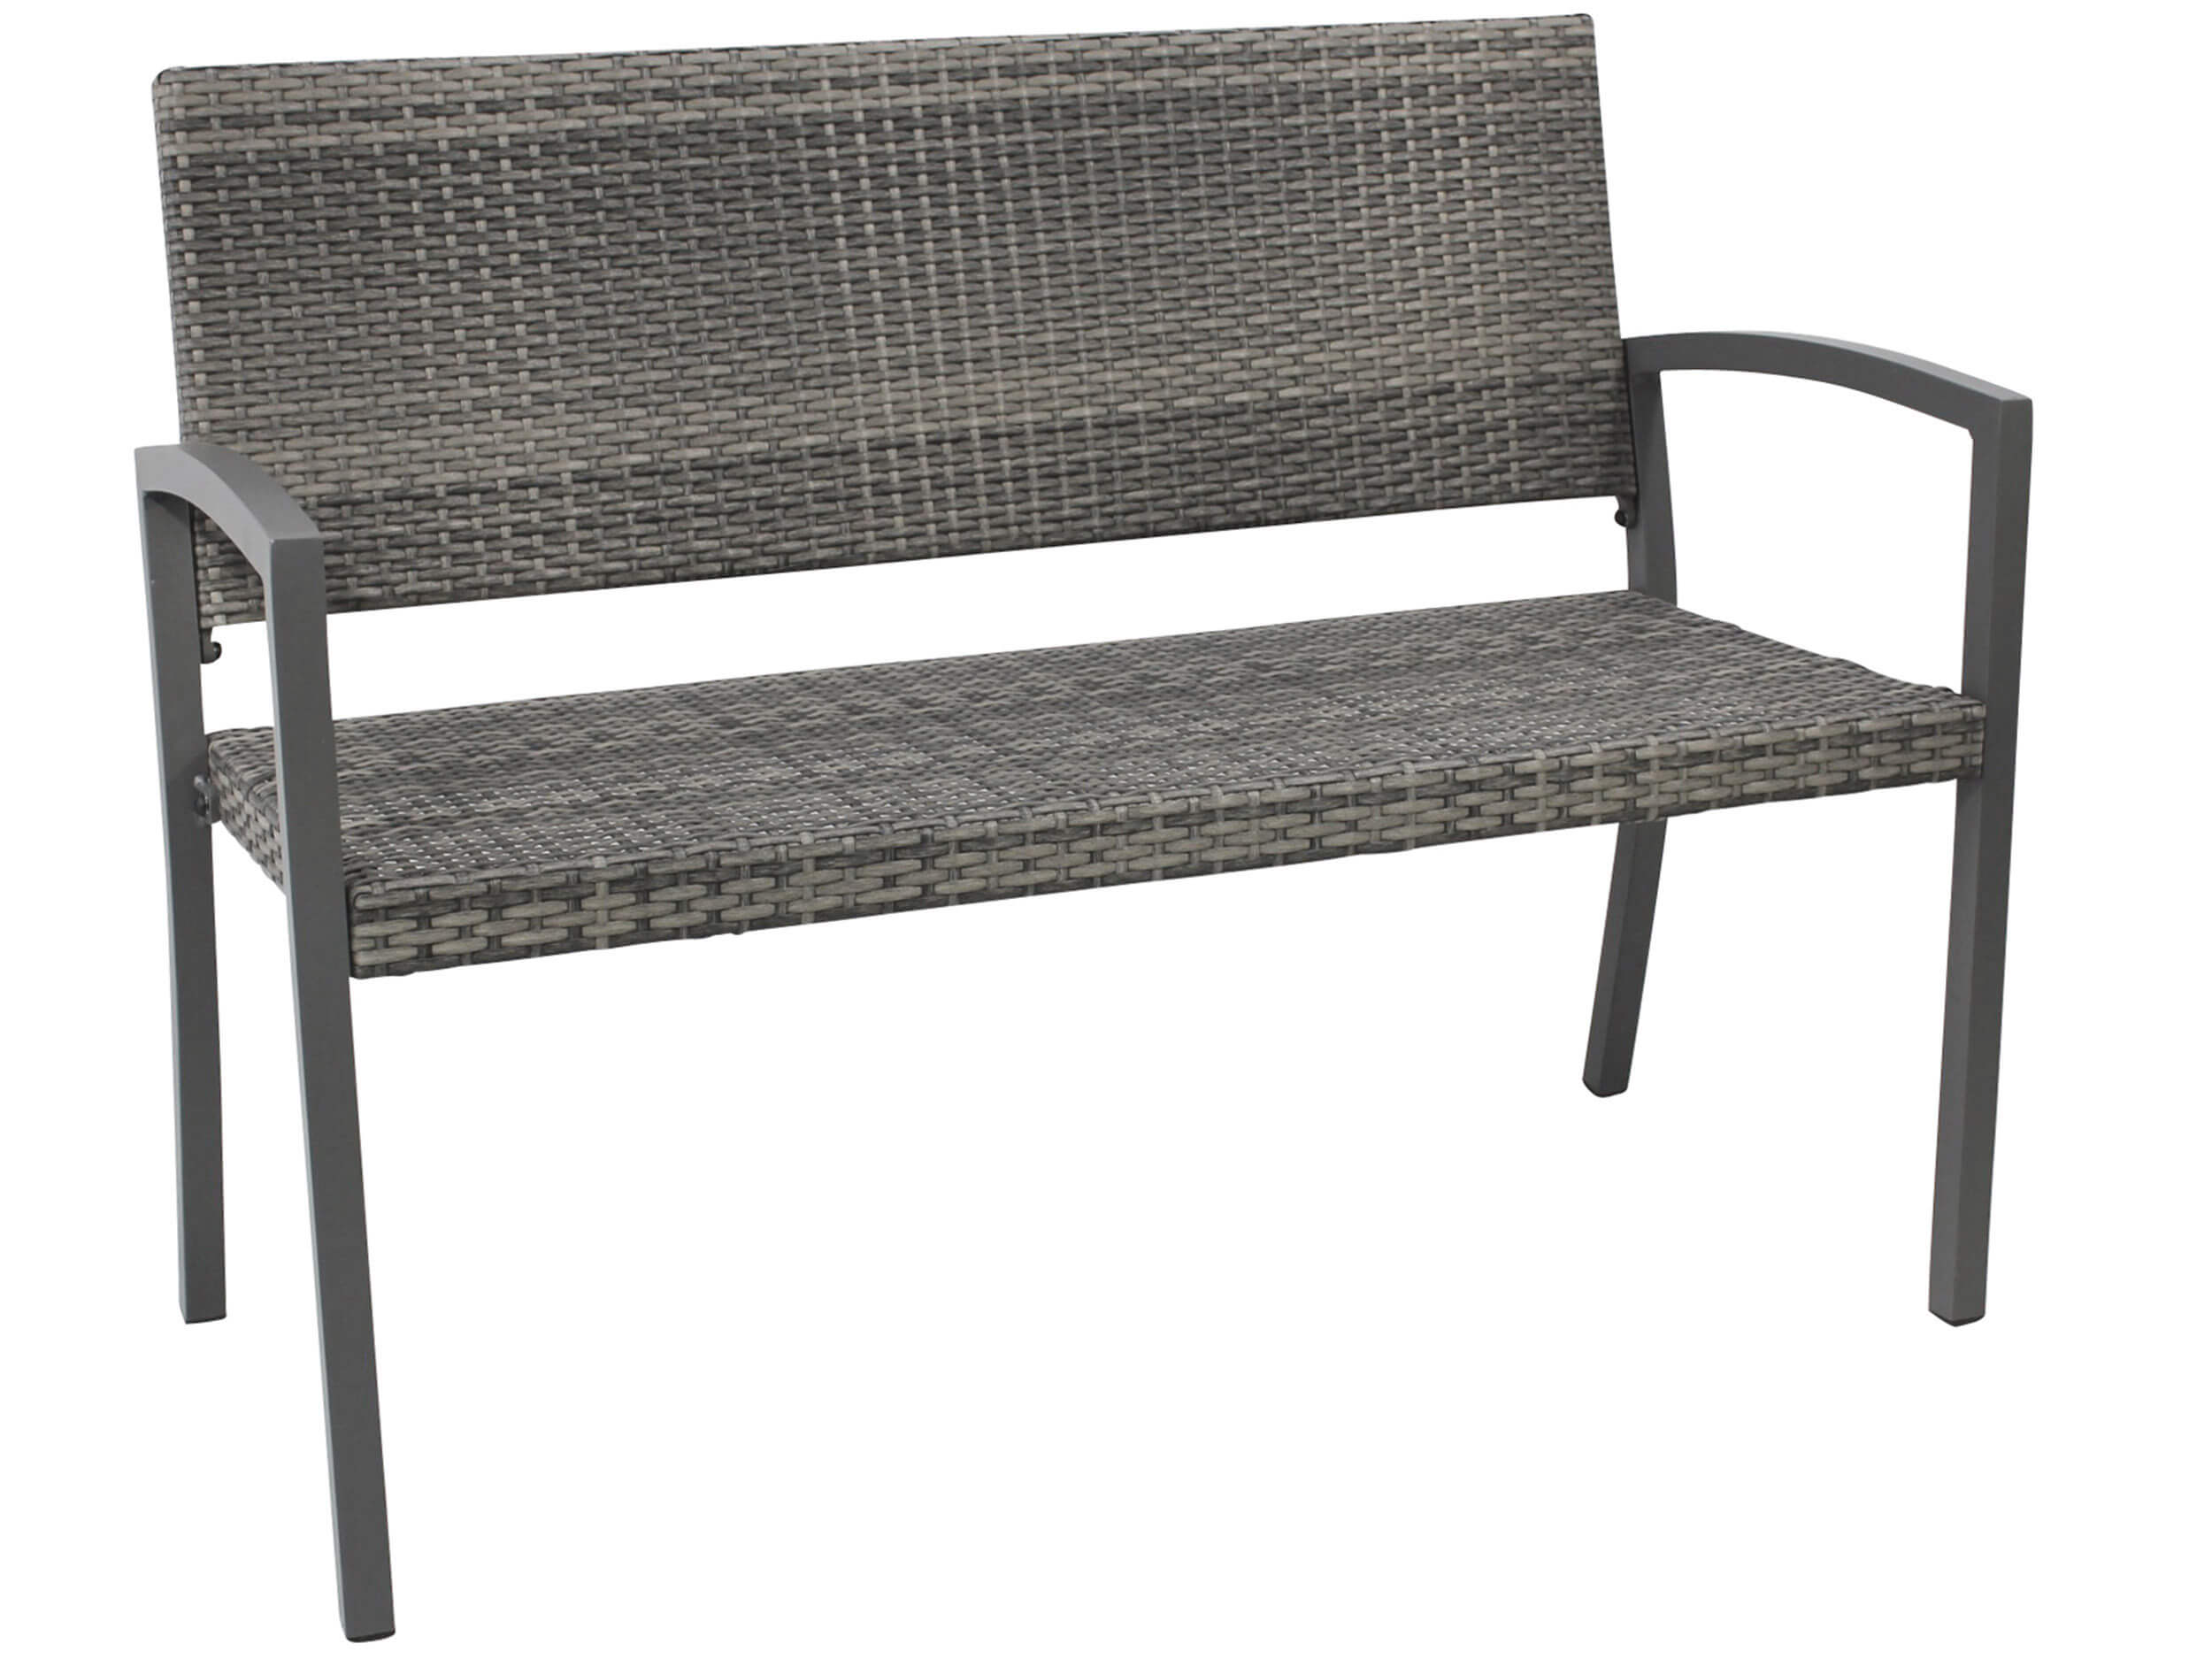 gartenb nke gartenbank metall gartenm bel l nse. Black Bedroom Furniture Sets. Home Design Ideas